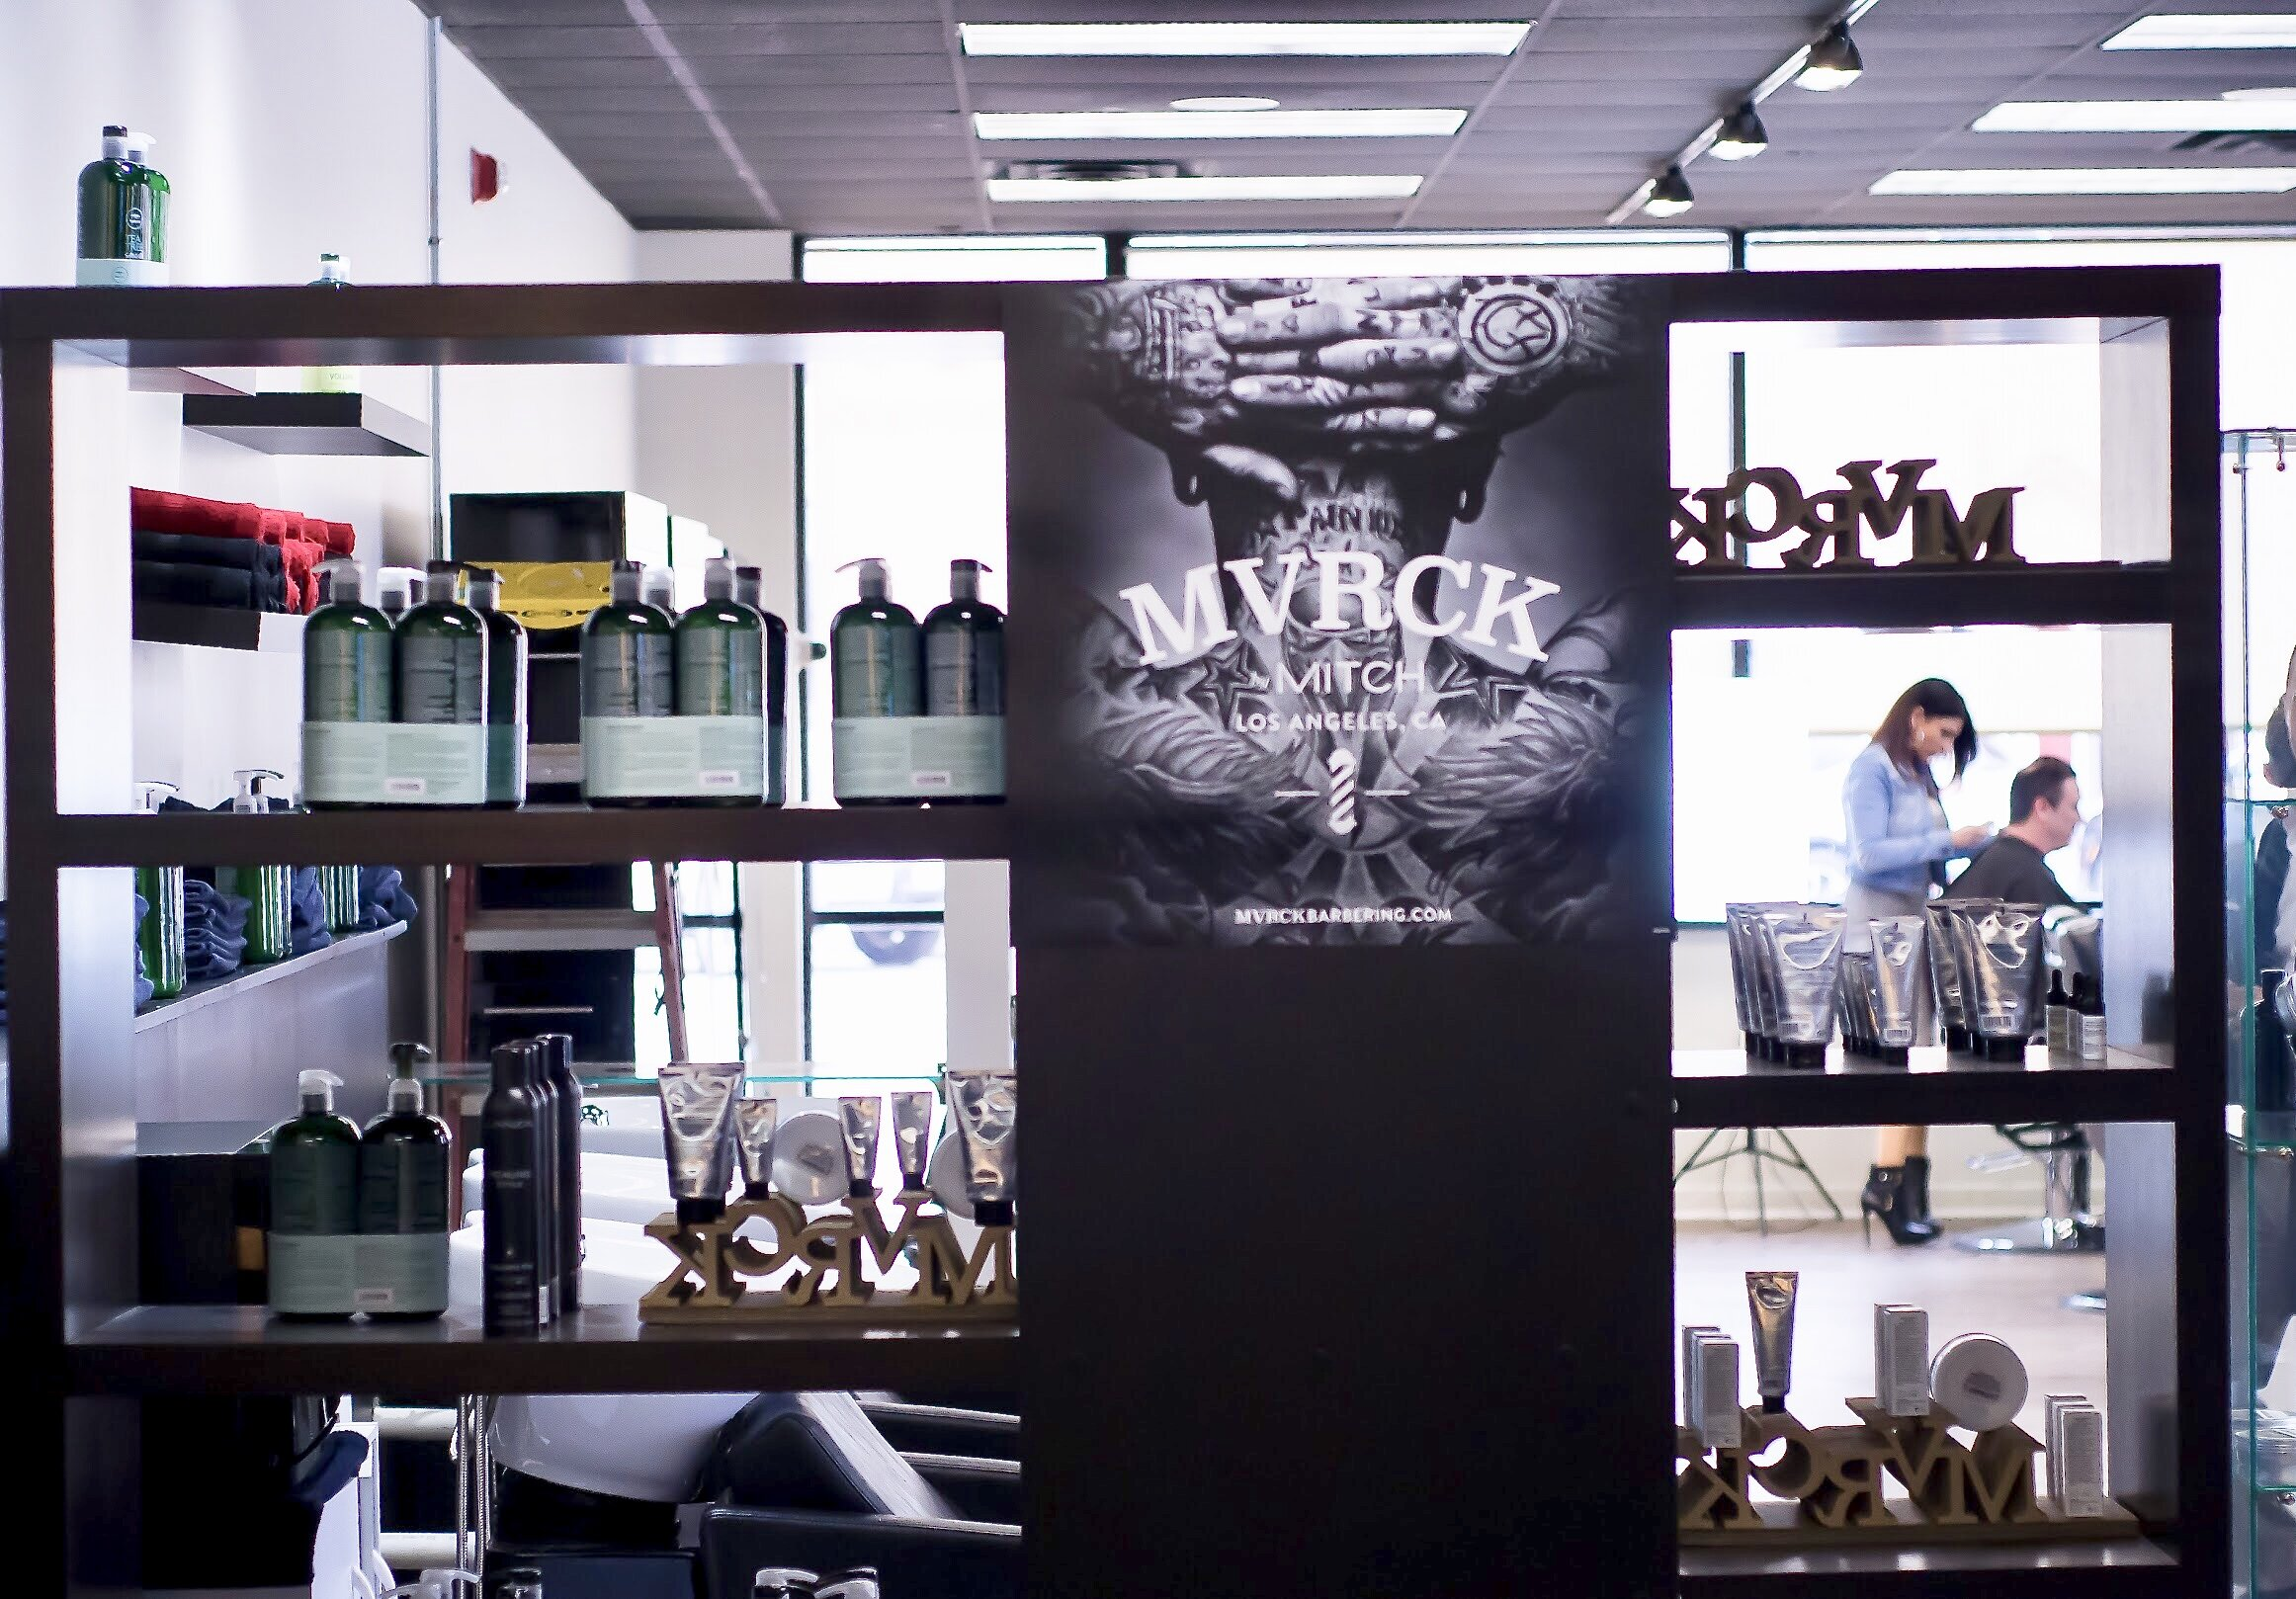 Upscale Men's Haircut Salon with Classic Barbering Service'sW Barber Spa & Salo Royal Oak